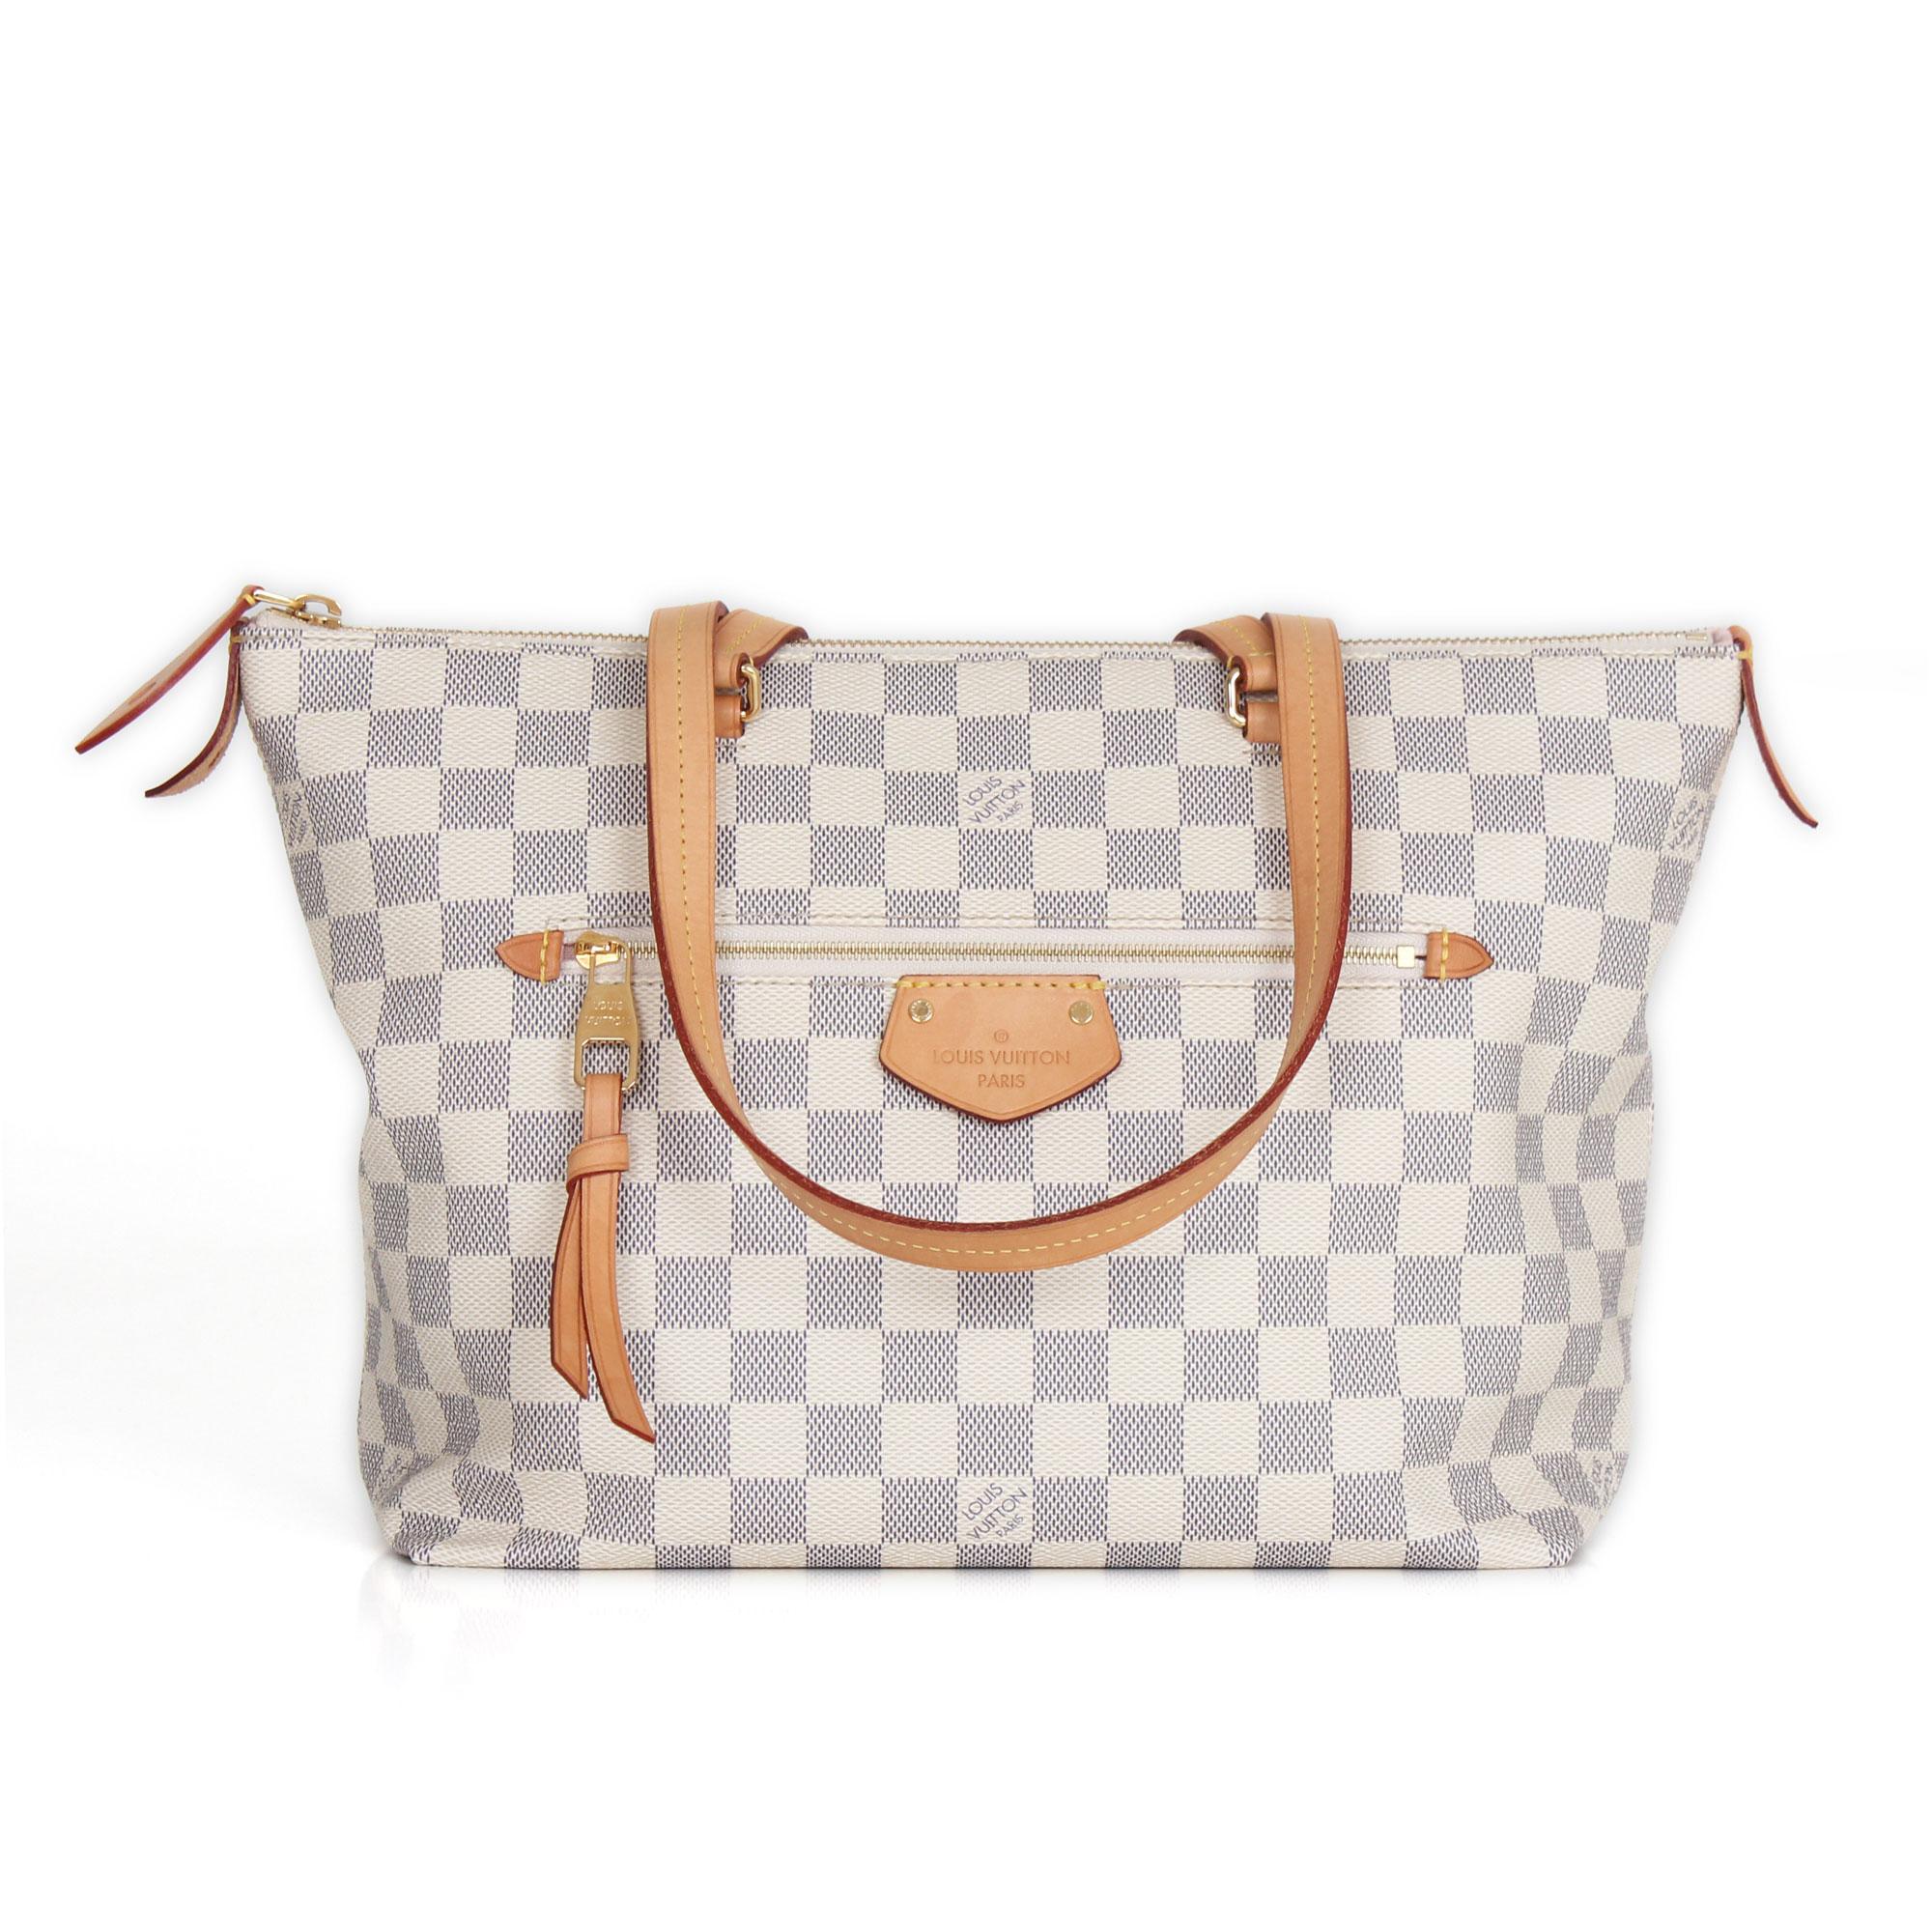 Louis Vuitton Damier Azur I 233 Na Pm Handbag Cbl Bags